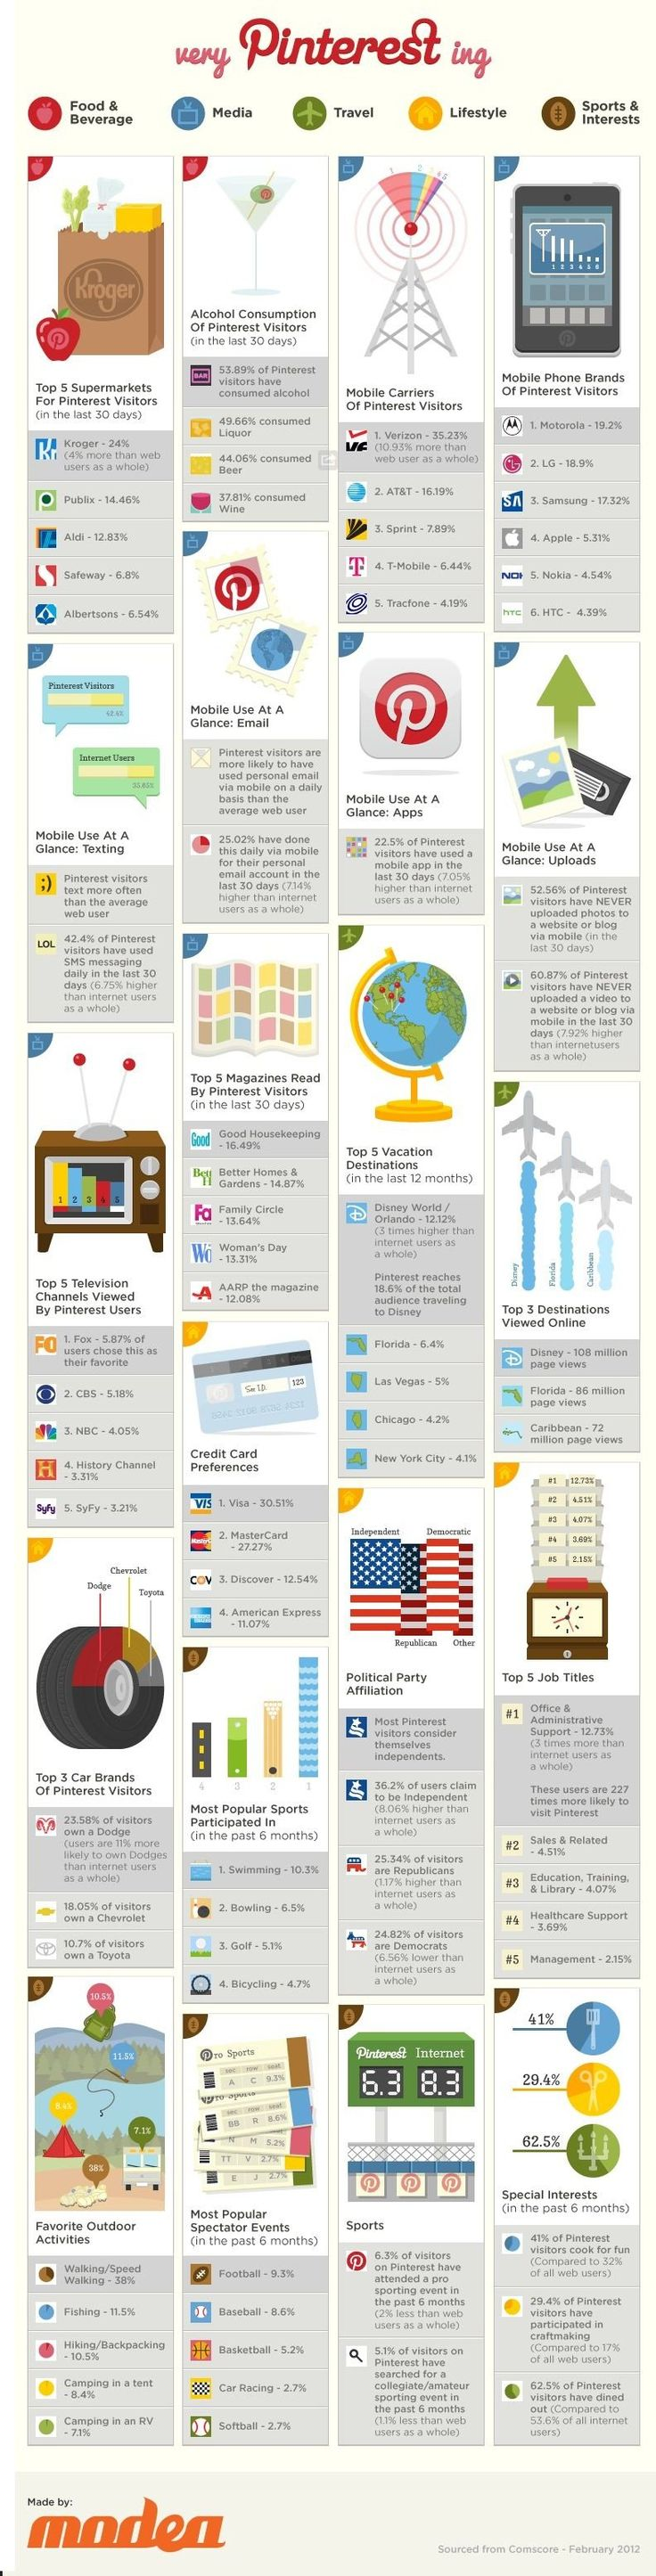 Tips to build your #Pinterest Presence #socialmedia